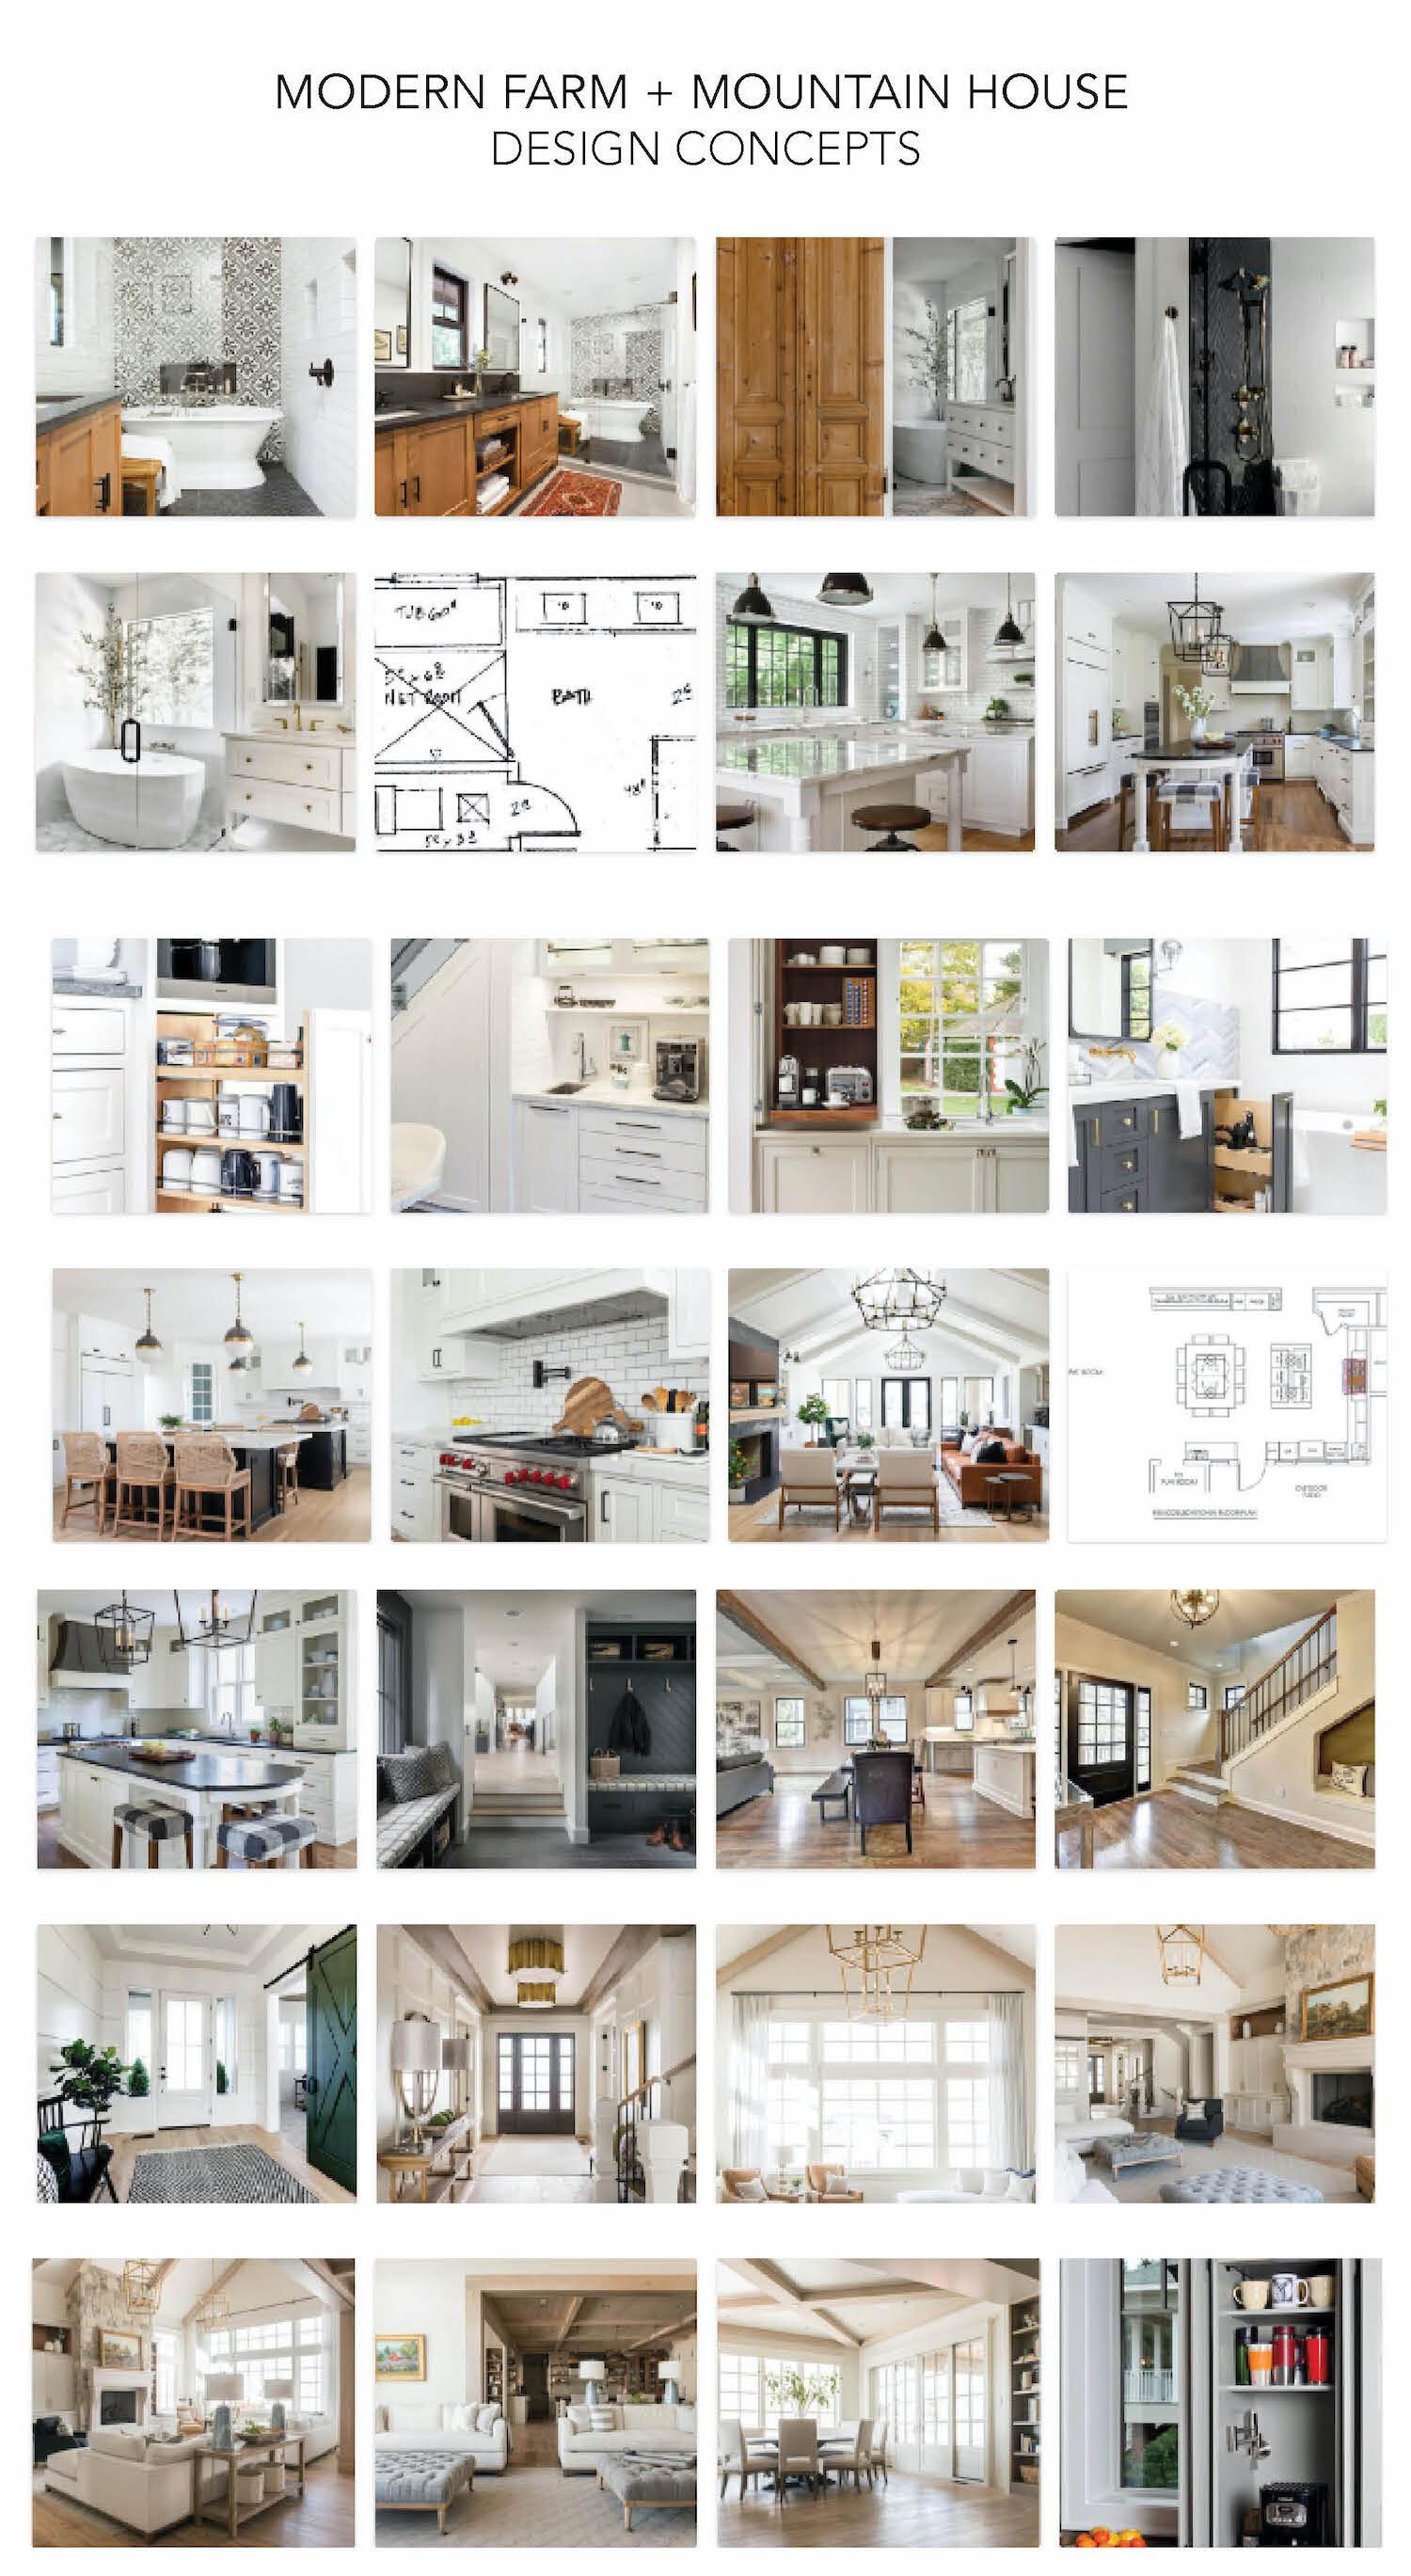 House Plans For A Mountain Home Northern California Tami Faulkner Design